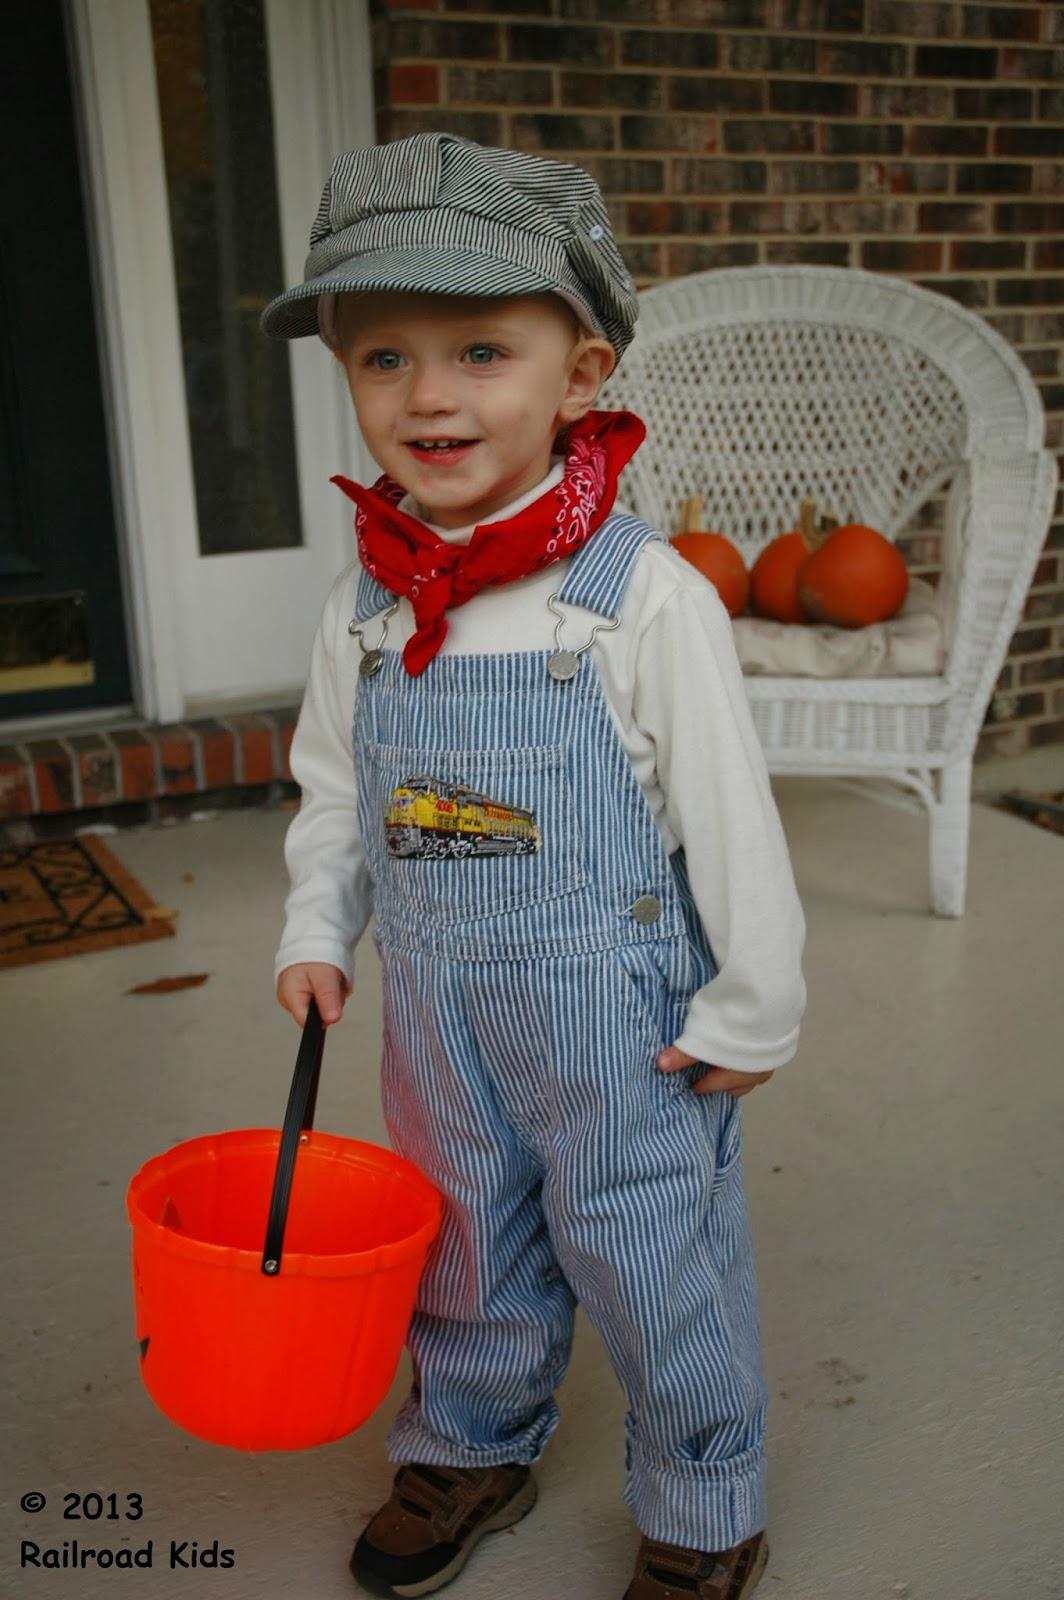 Halloween Costume Train Engineer Redux  sc 1 st  Railroad Kids & Railroad Kids: Halloween Costume: Train Engineer Redux